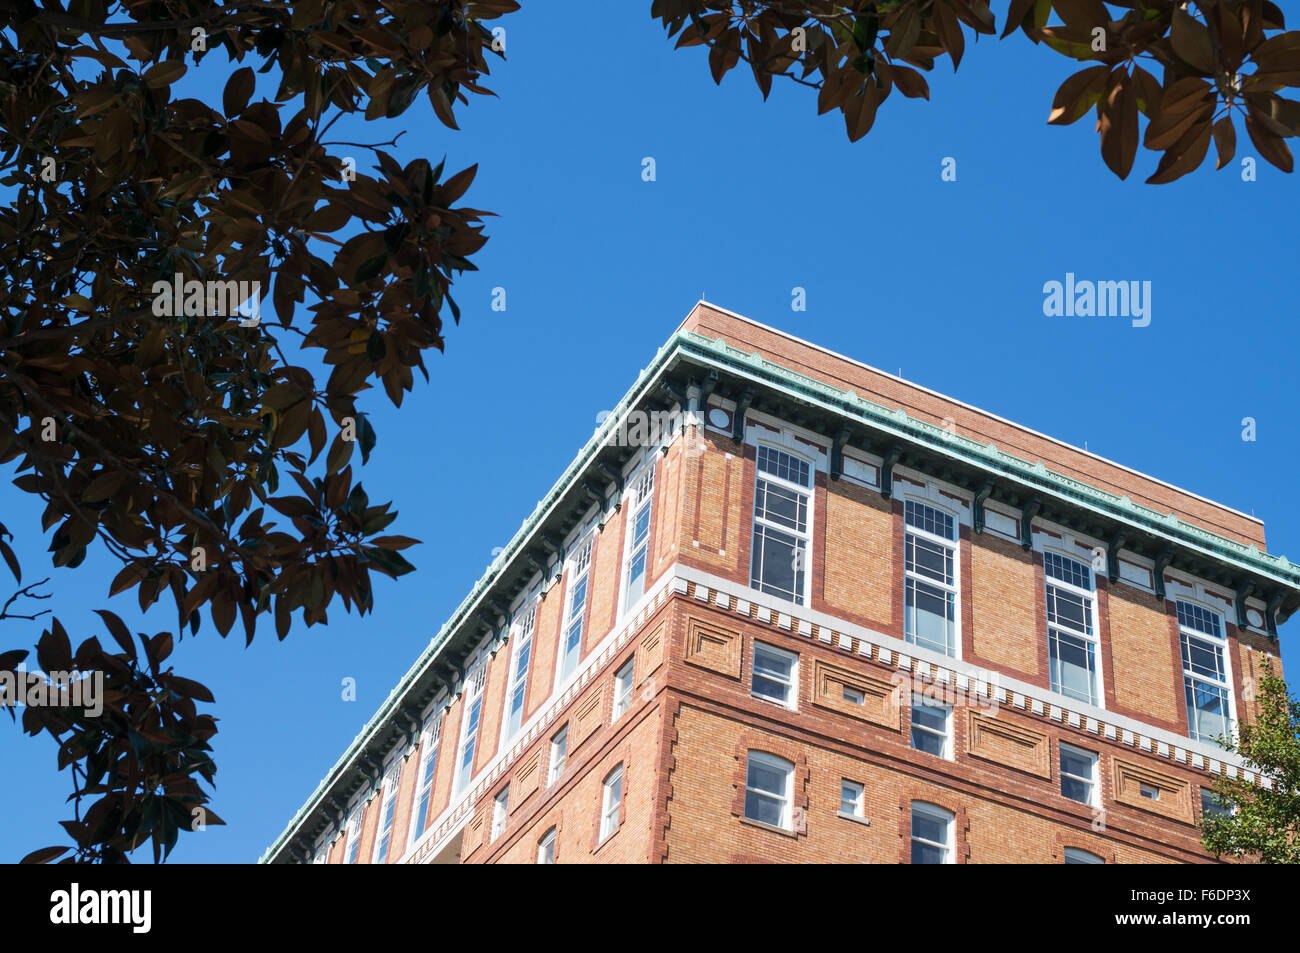 Detailed view of the Hotel Richmond, Richmond USA, Virginia  USA - Stock Image